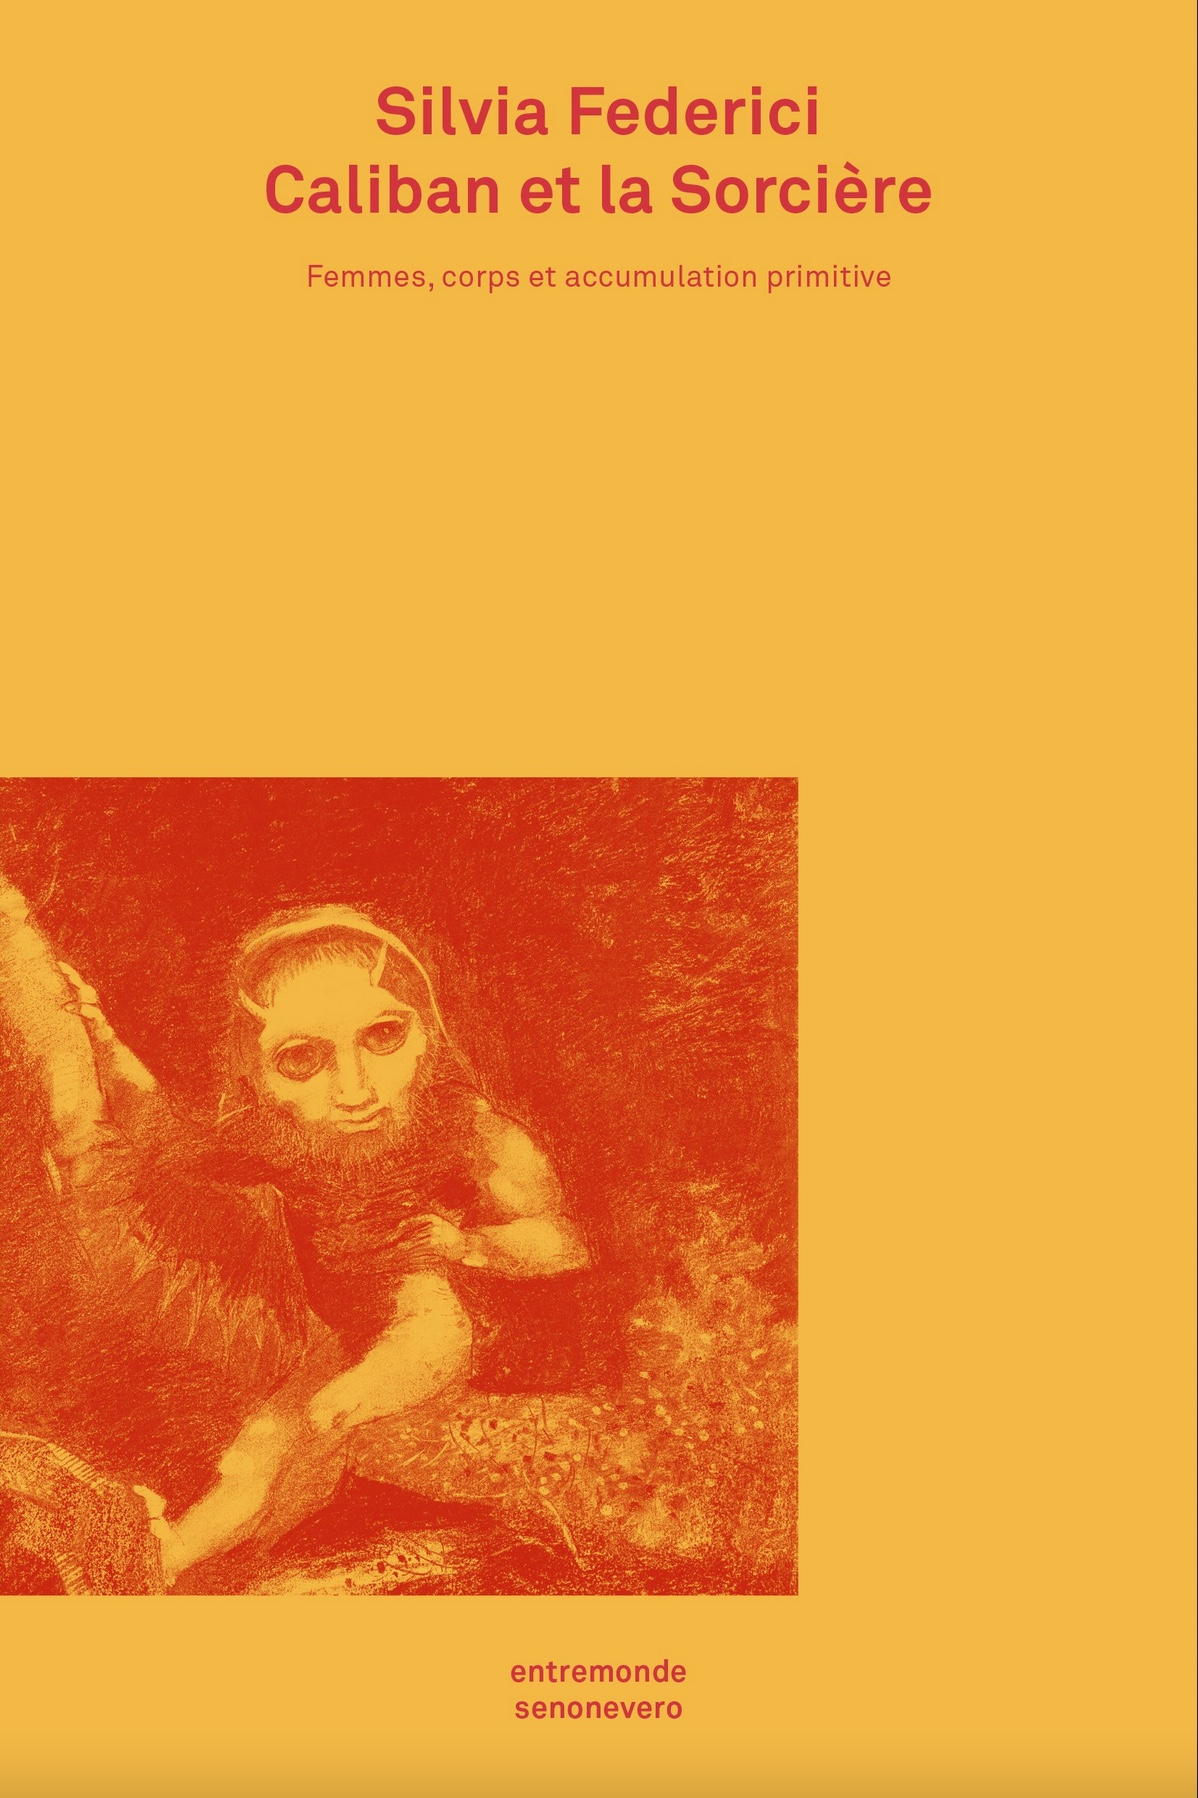 Caliban et la Sorcière, Silvia Federici